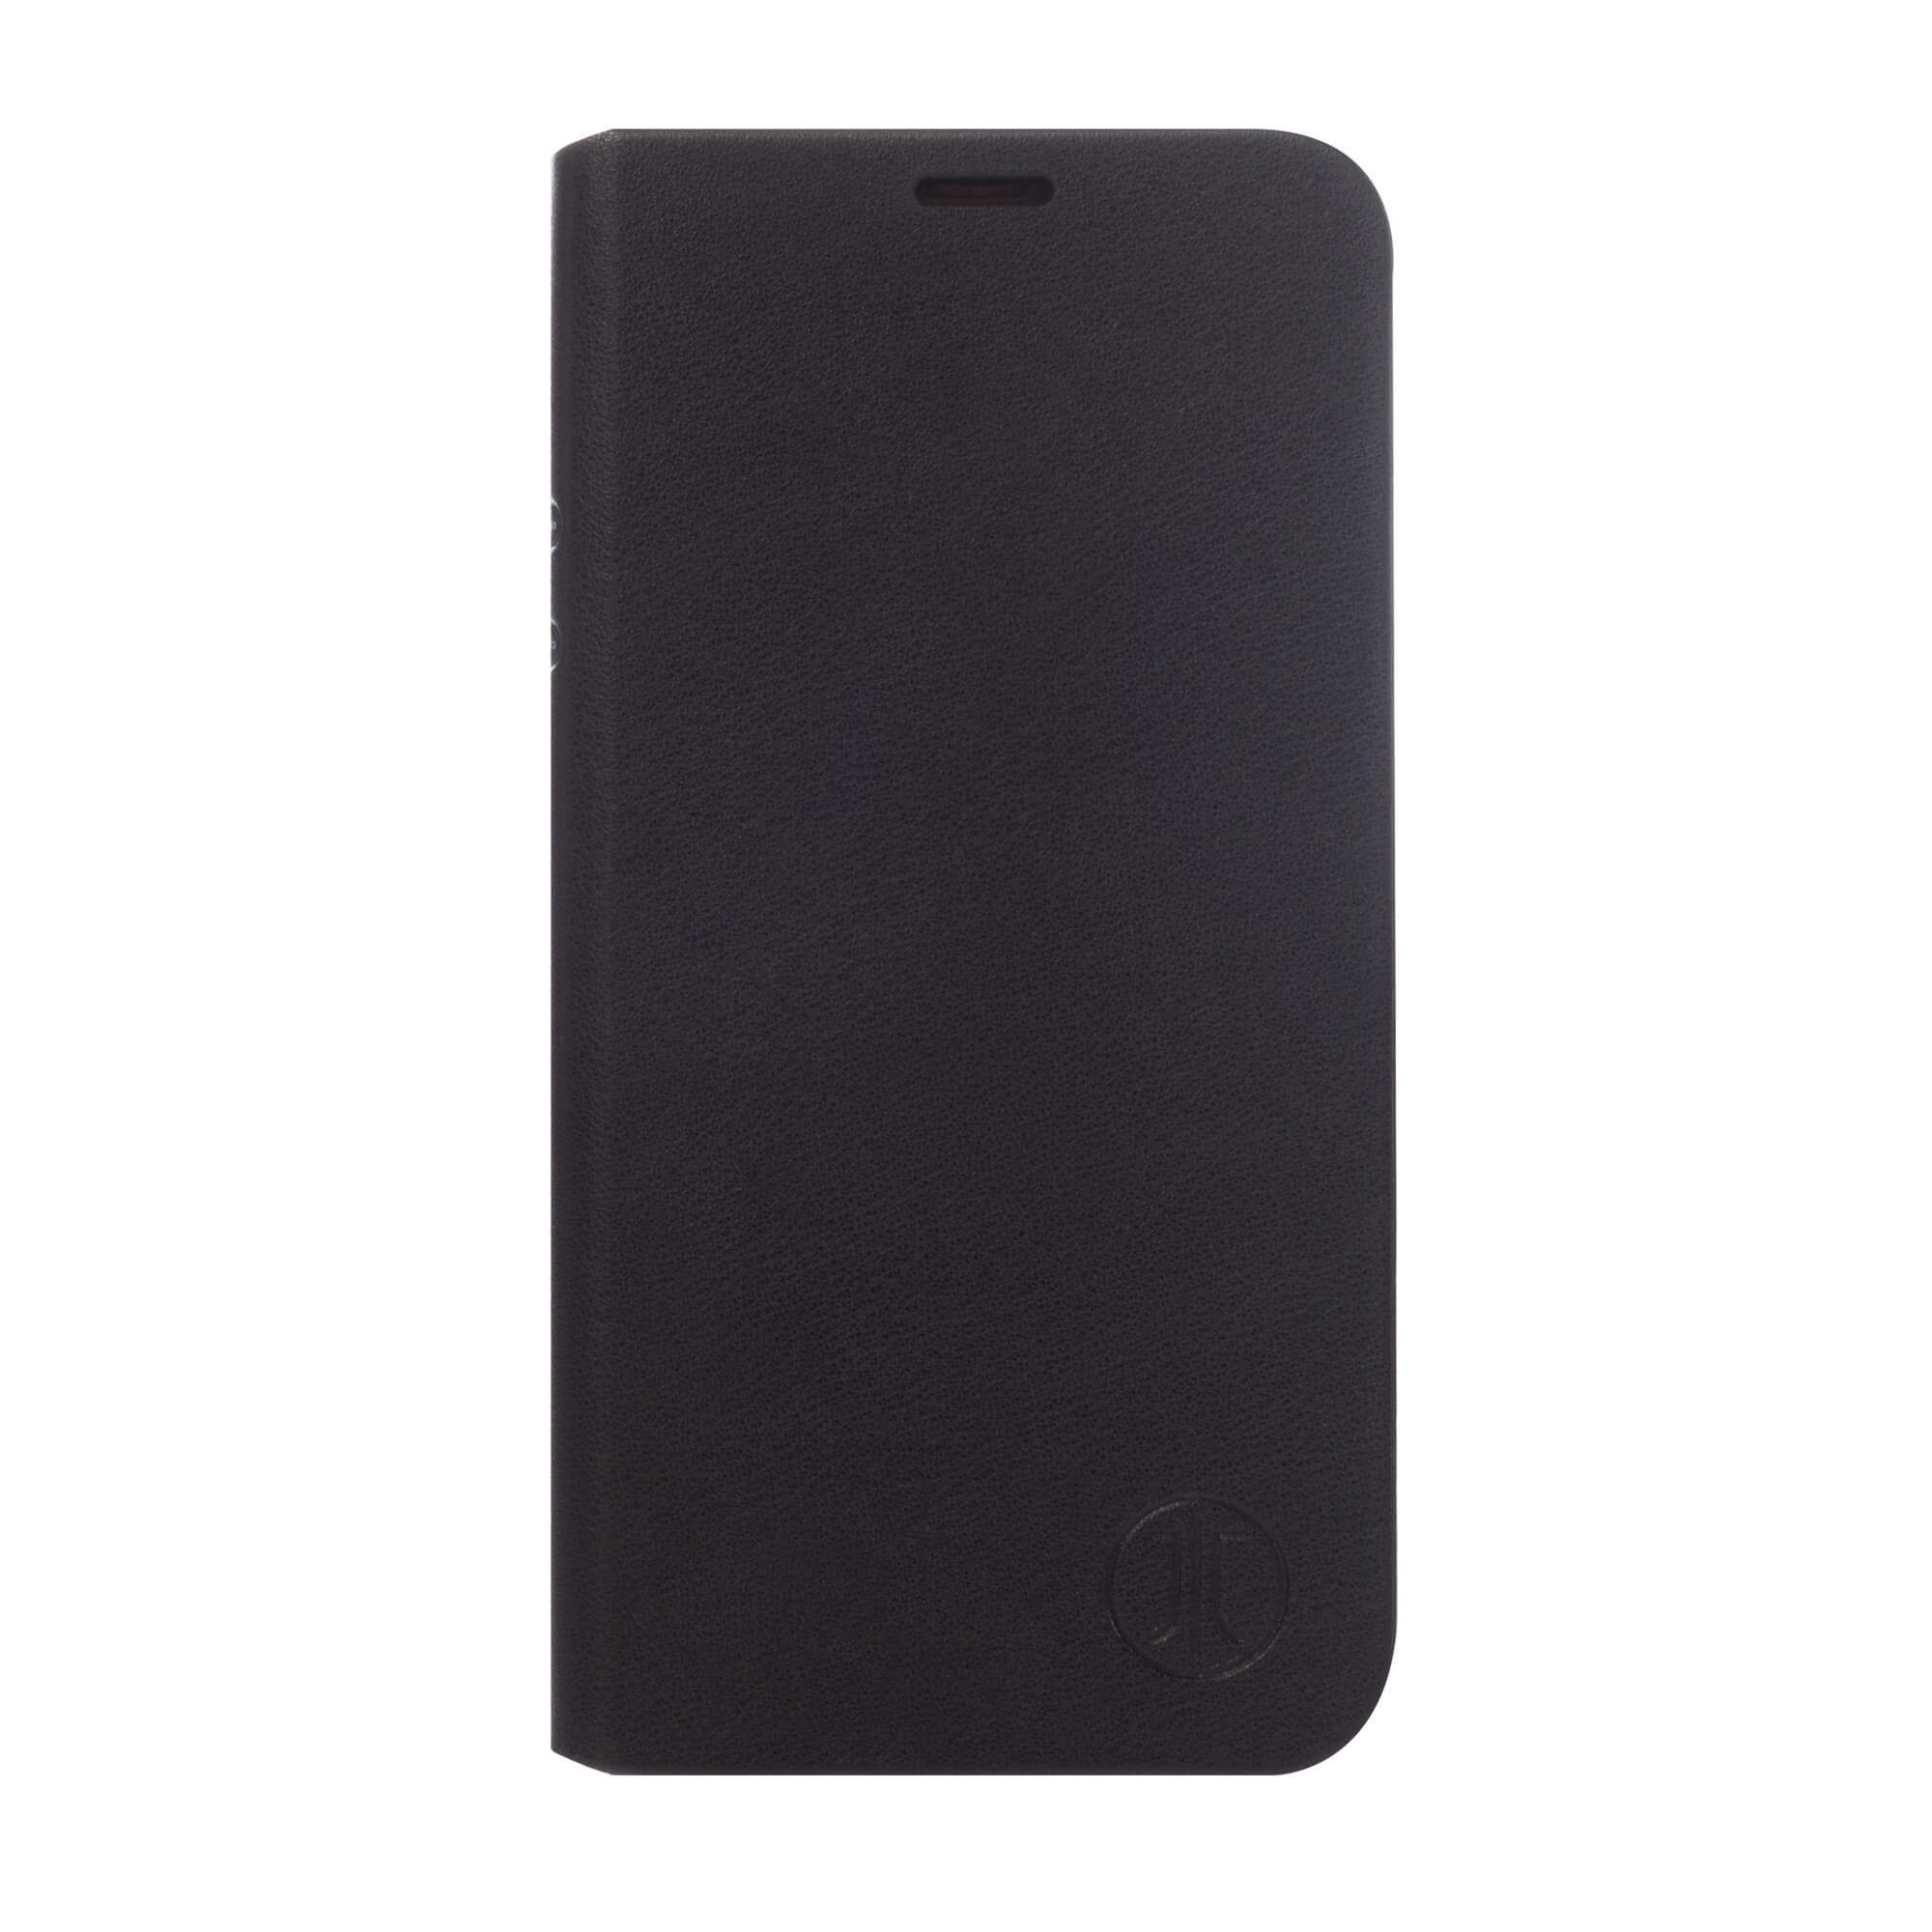 JT Berlin Folio Case for iPhone XS Max (black)